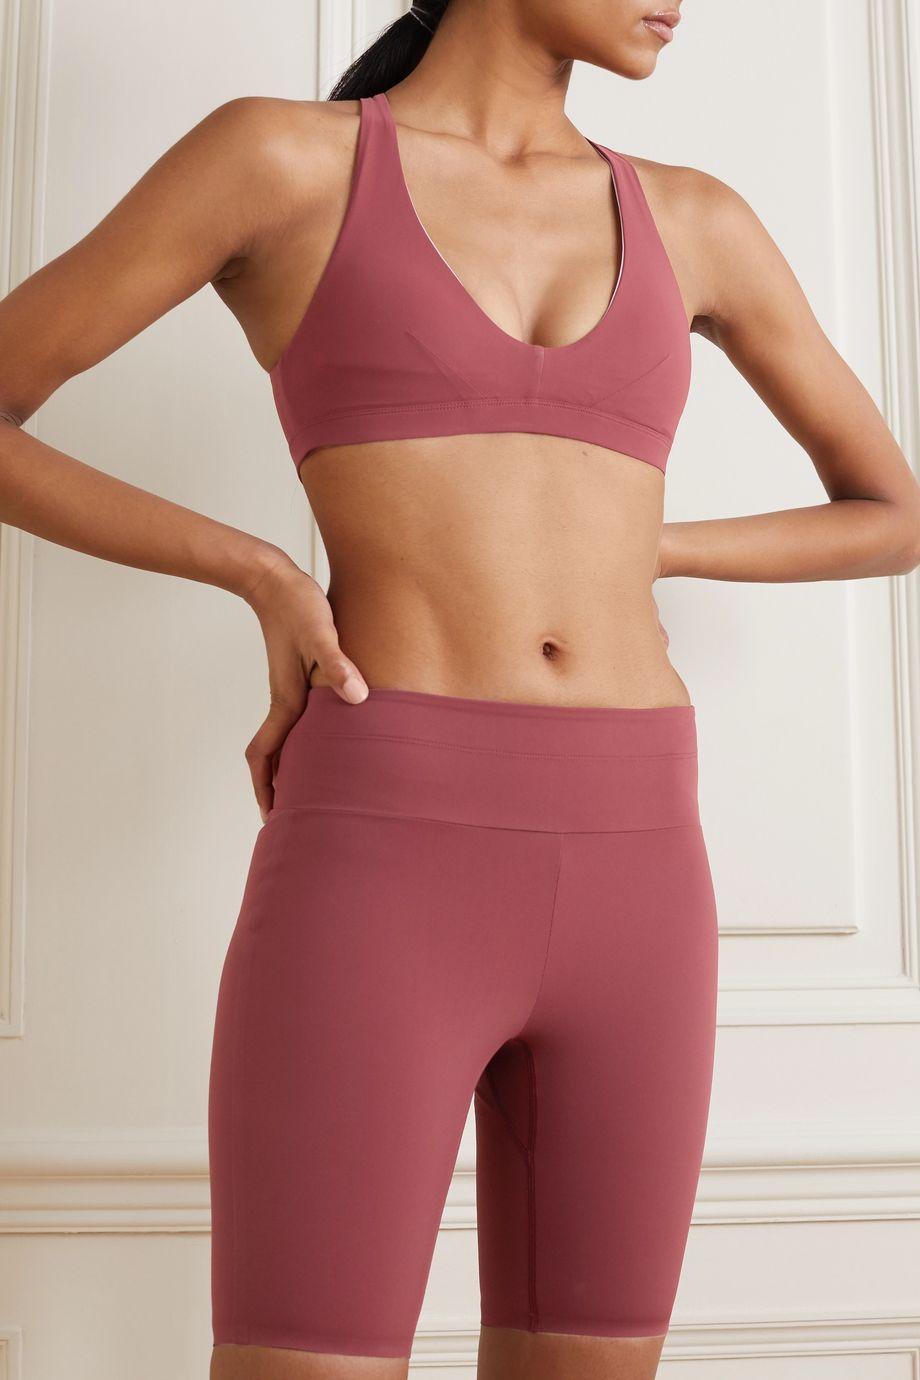 Vaara Maribel stretch sports bra